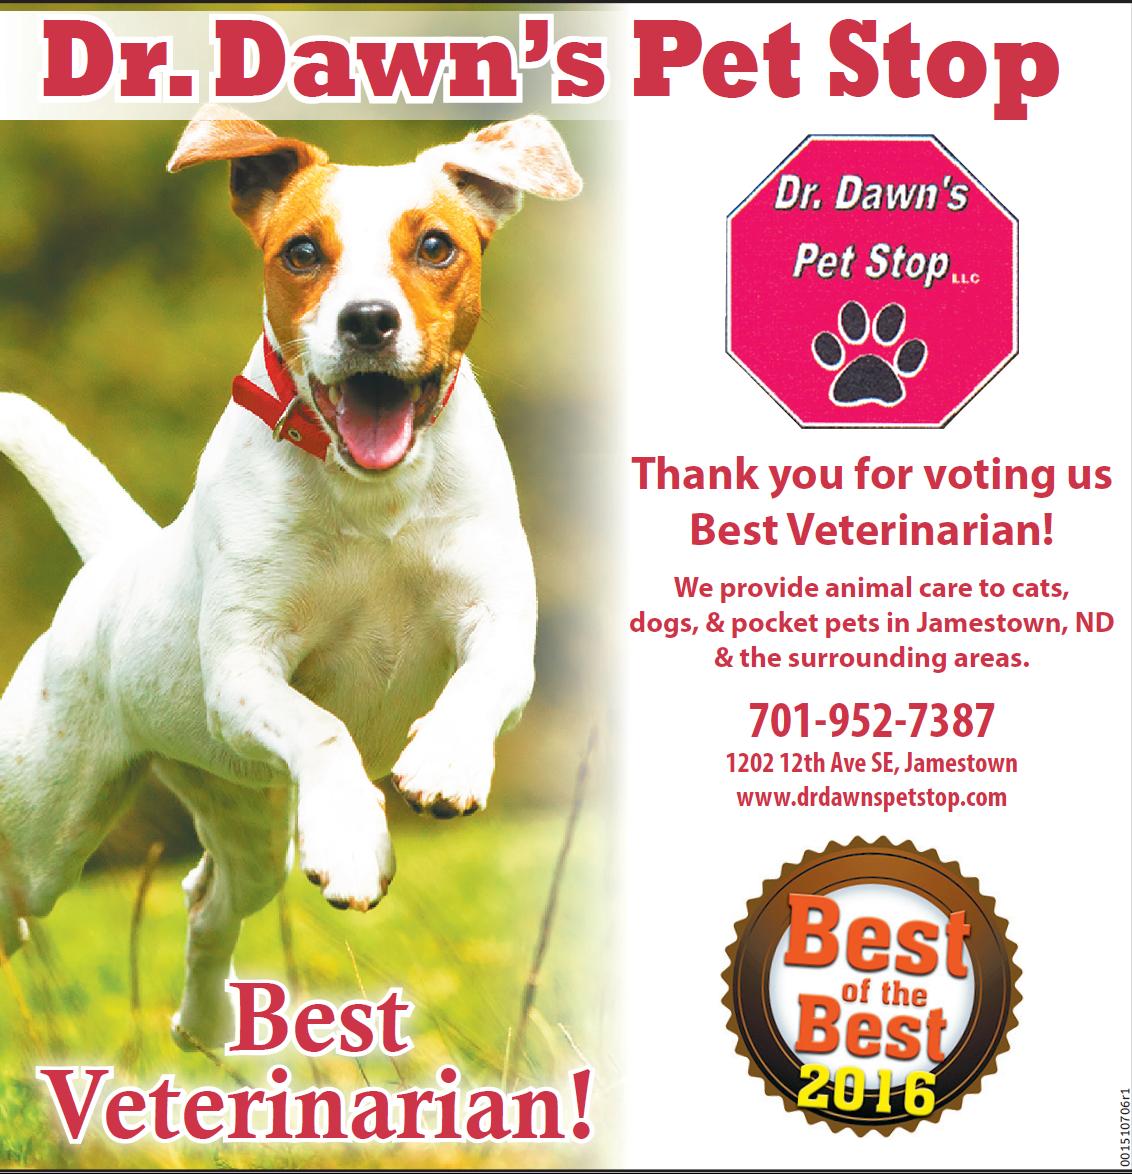 Dr. Dawn's Pet Stop LLC image 2